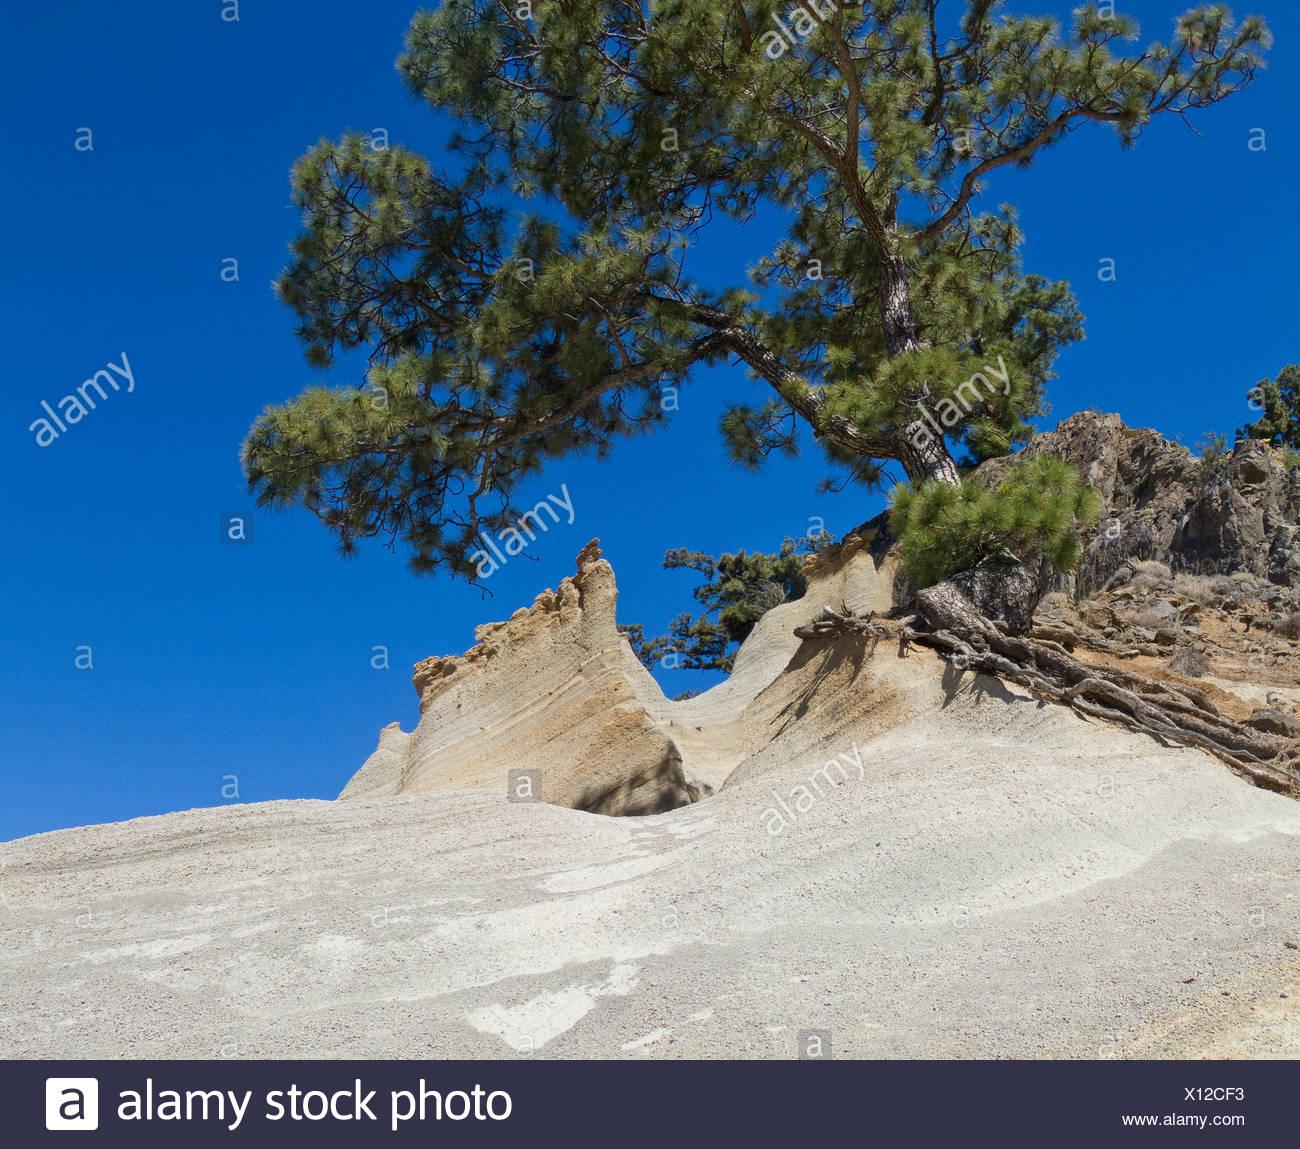 Spain Europe Tenerife Paisaje Lunar Vilaflor Canary islands Landscape scenery nature Spring Mountains Hills - Stock Image